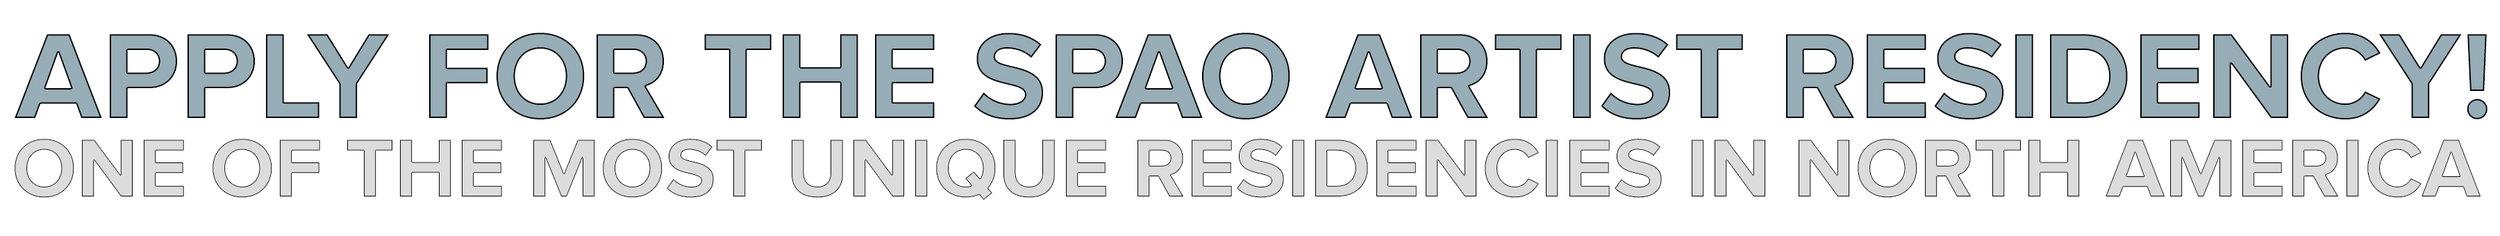 spao_artist_residency.jpg